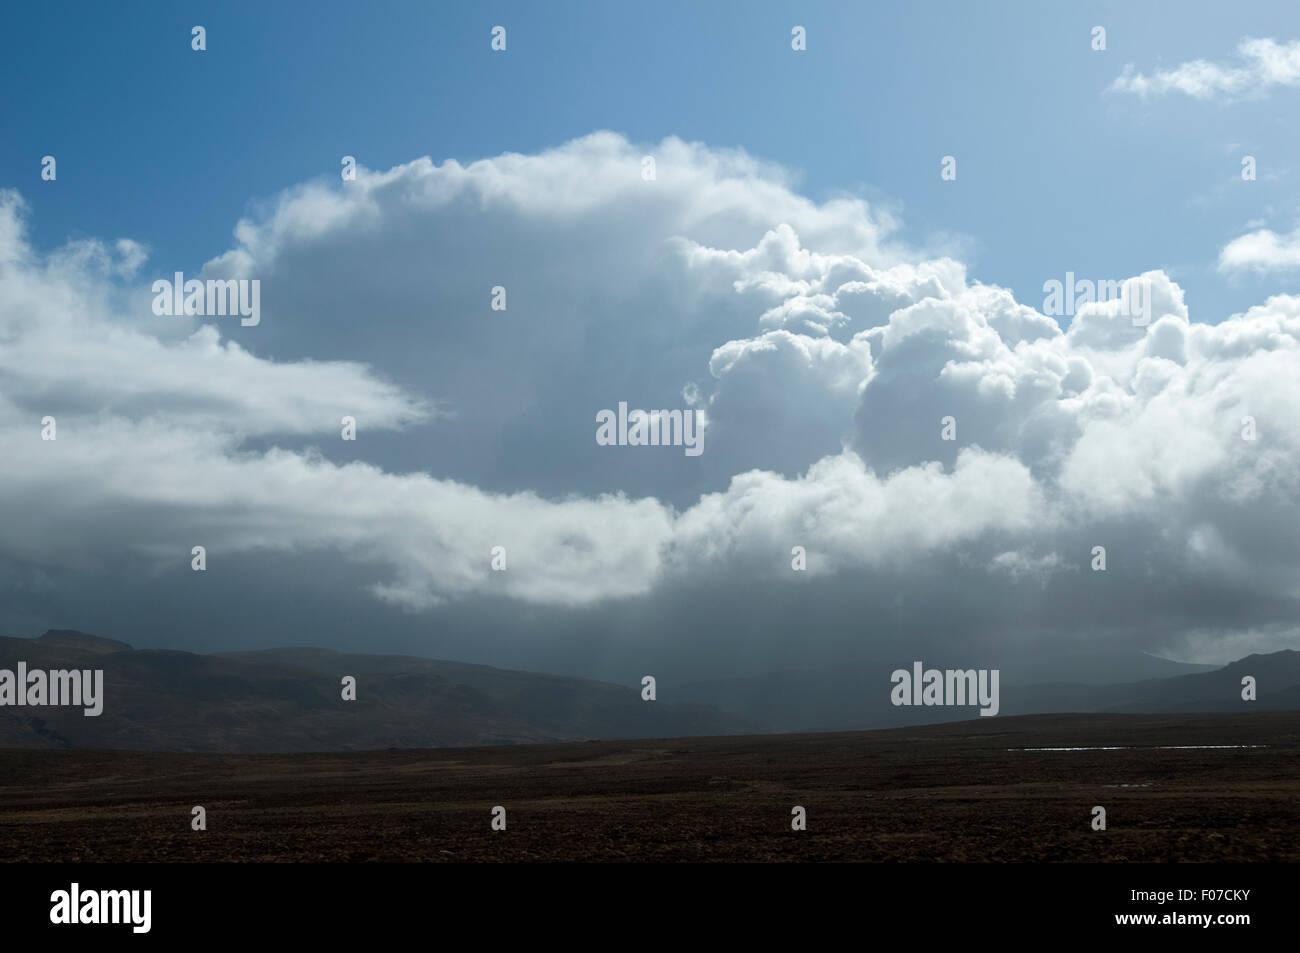 Cumulonimbus shower cloud near Blairmore, Sutherland, Scotland, UK. - Stock Image